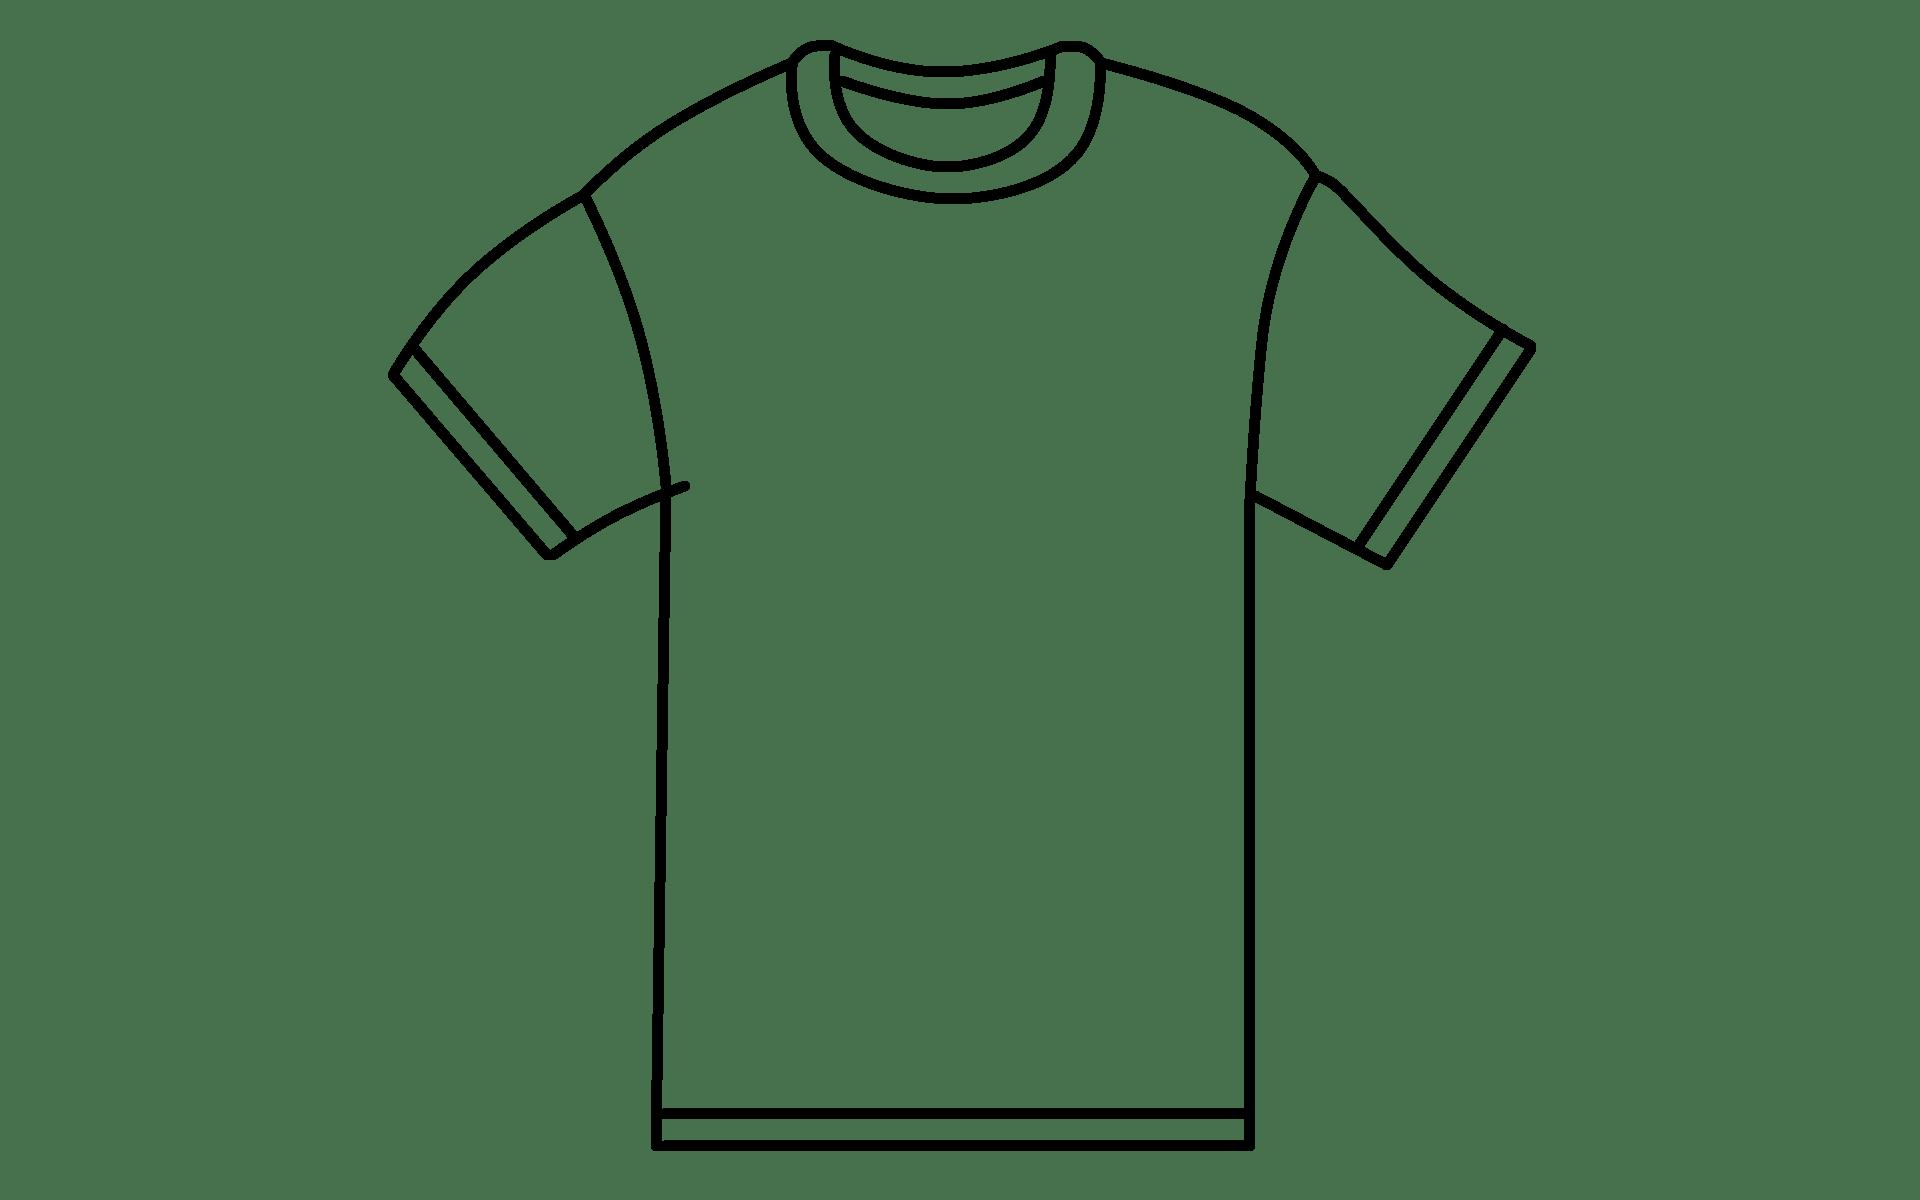 Drawn Tshirt Template Streetwearstartup